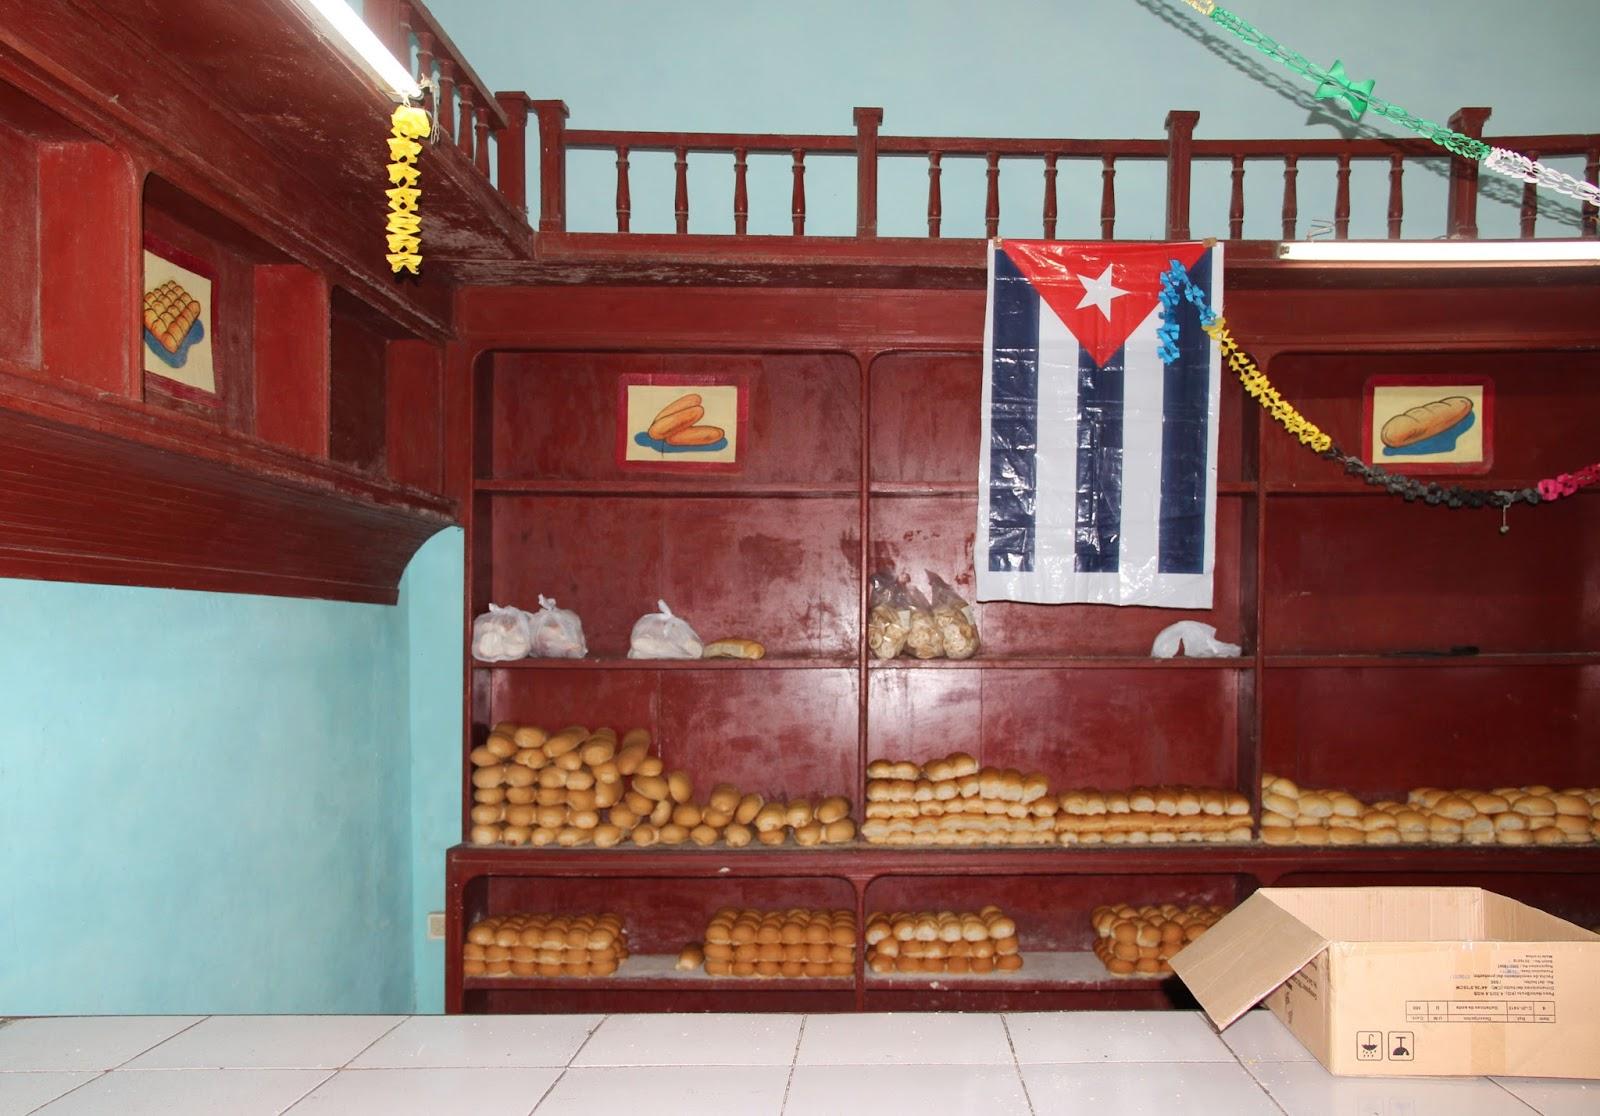 Cuba communism